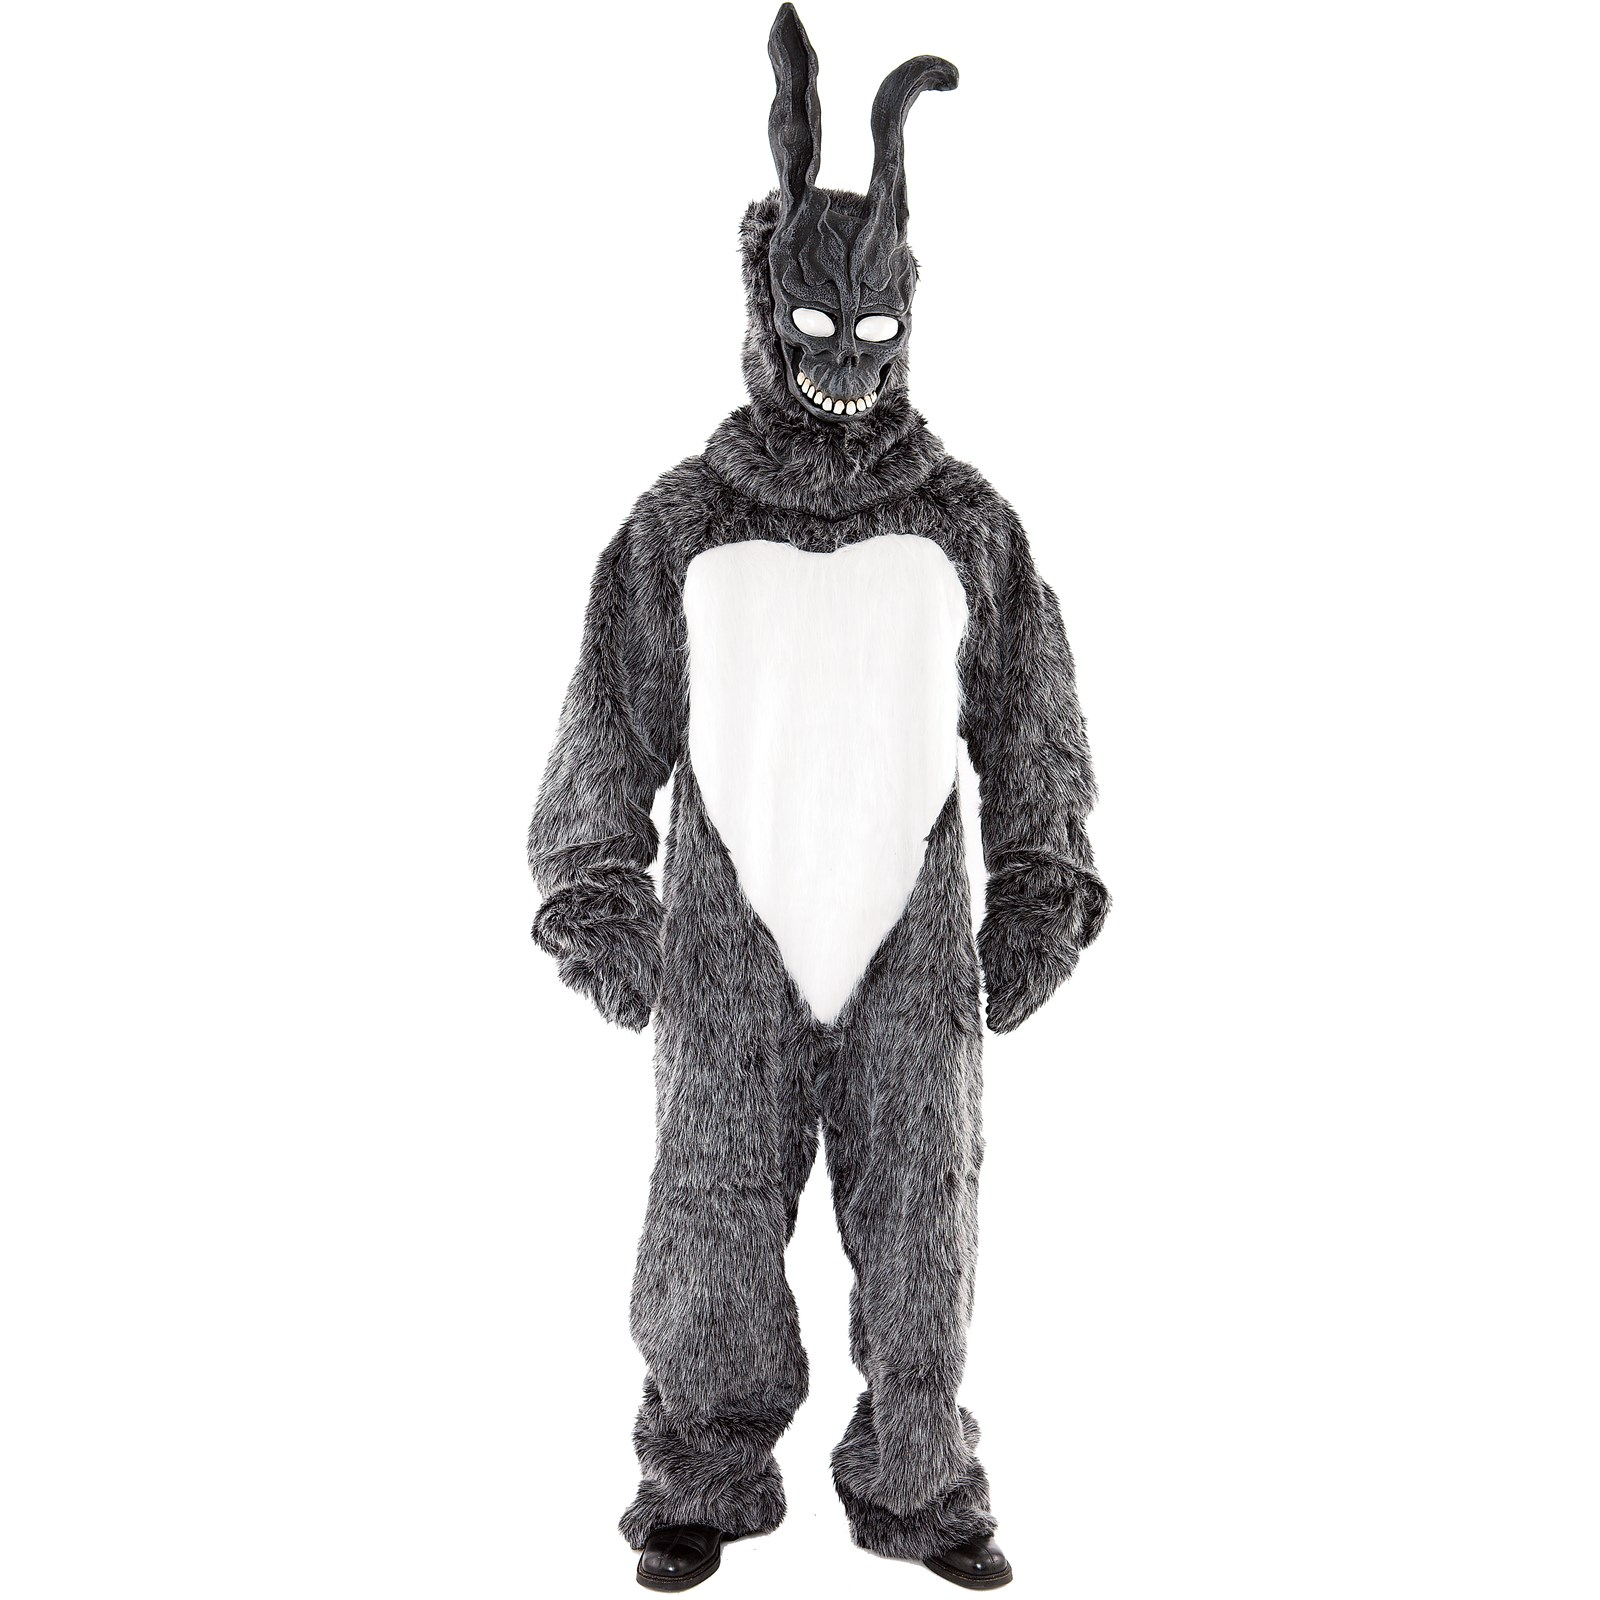 Donnie Darko - Frank Adult Costume | BuyCostumes.com